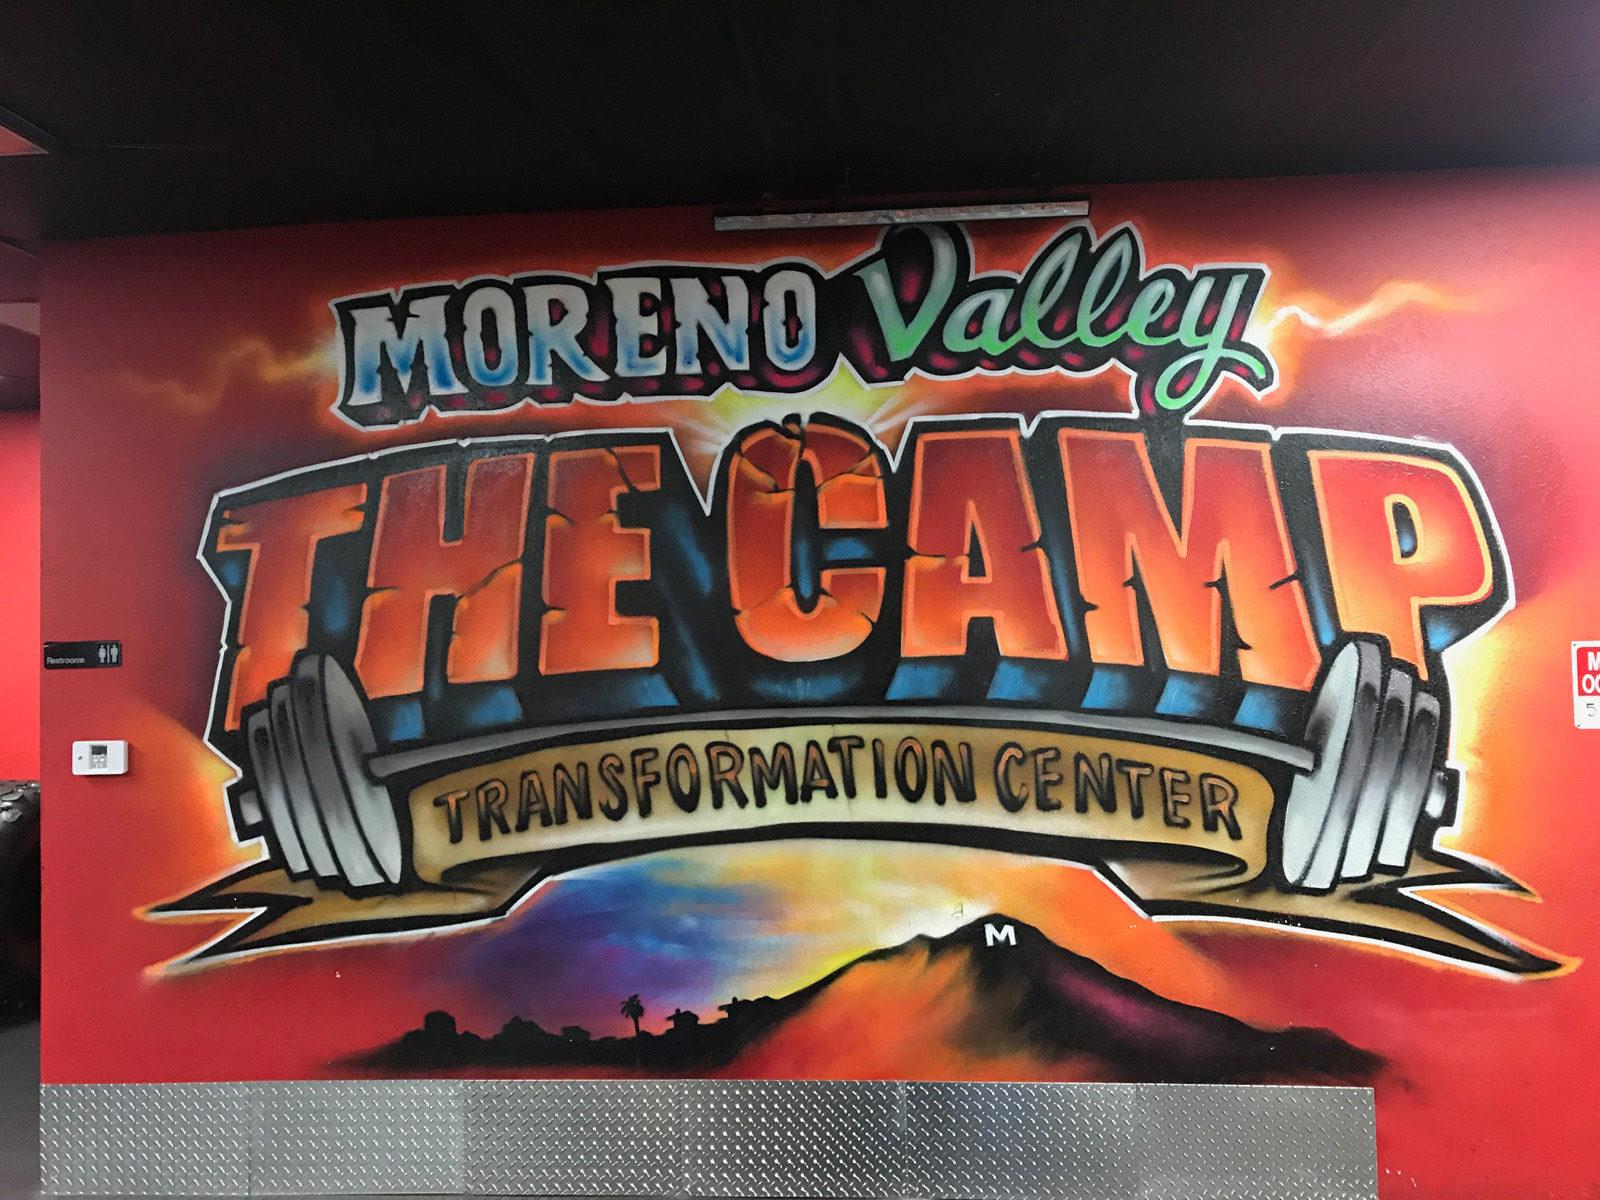 The Camp Moreno Valley